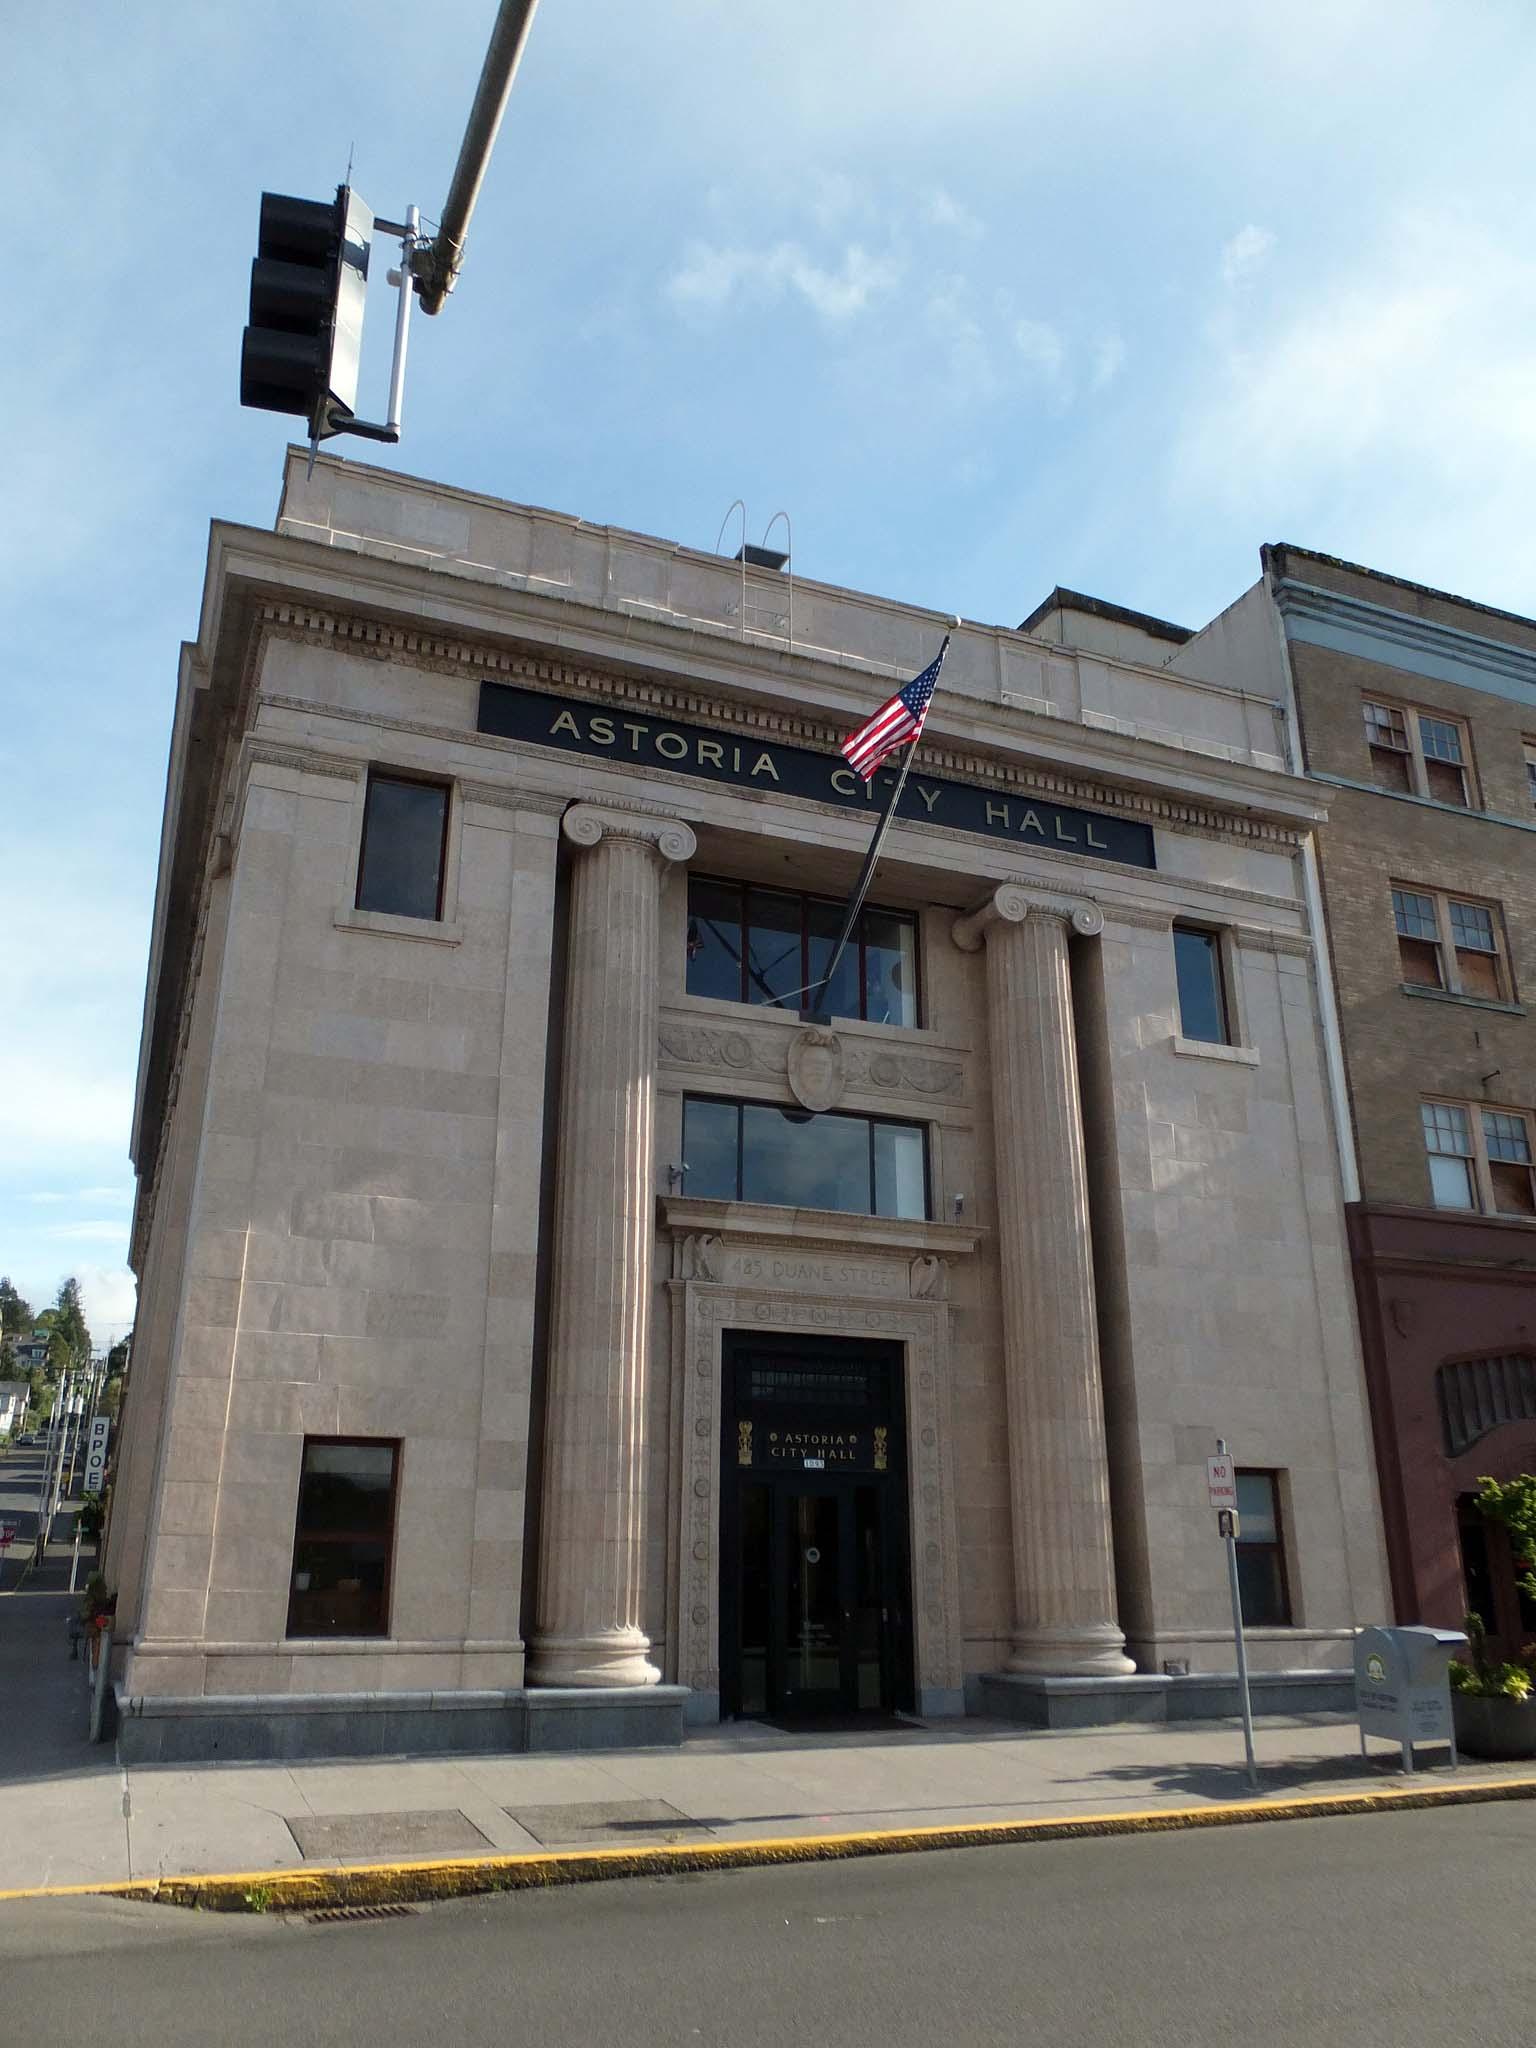 Astoria's City Hall.